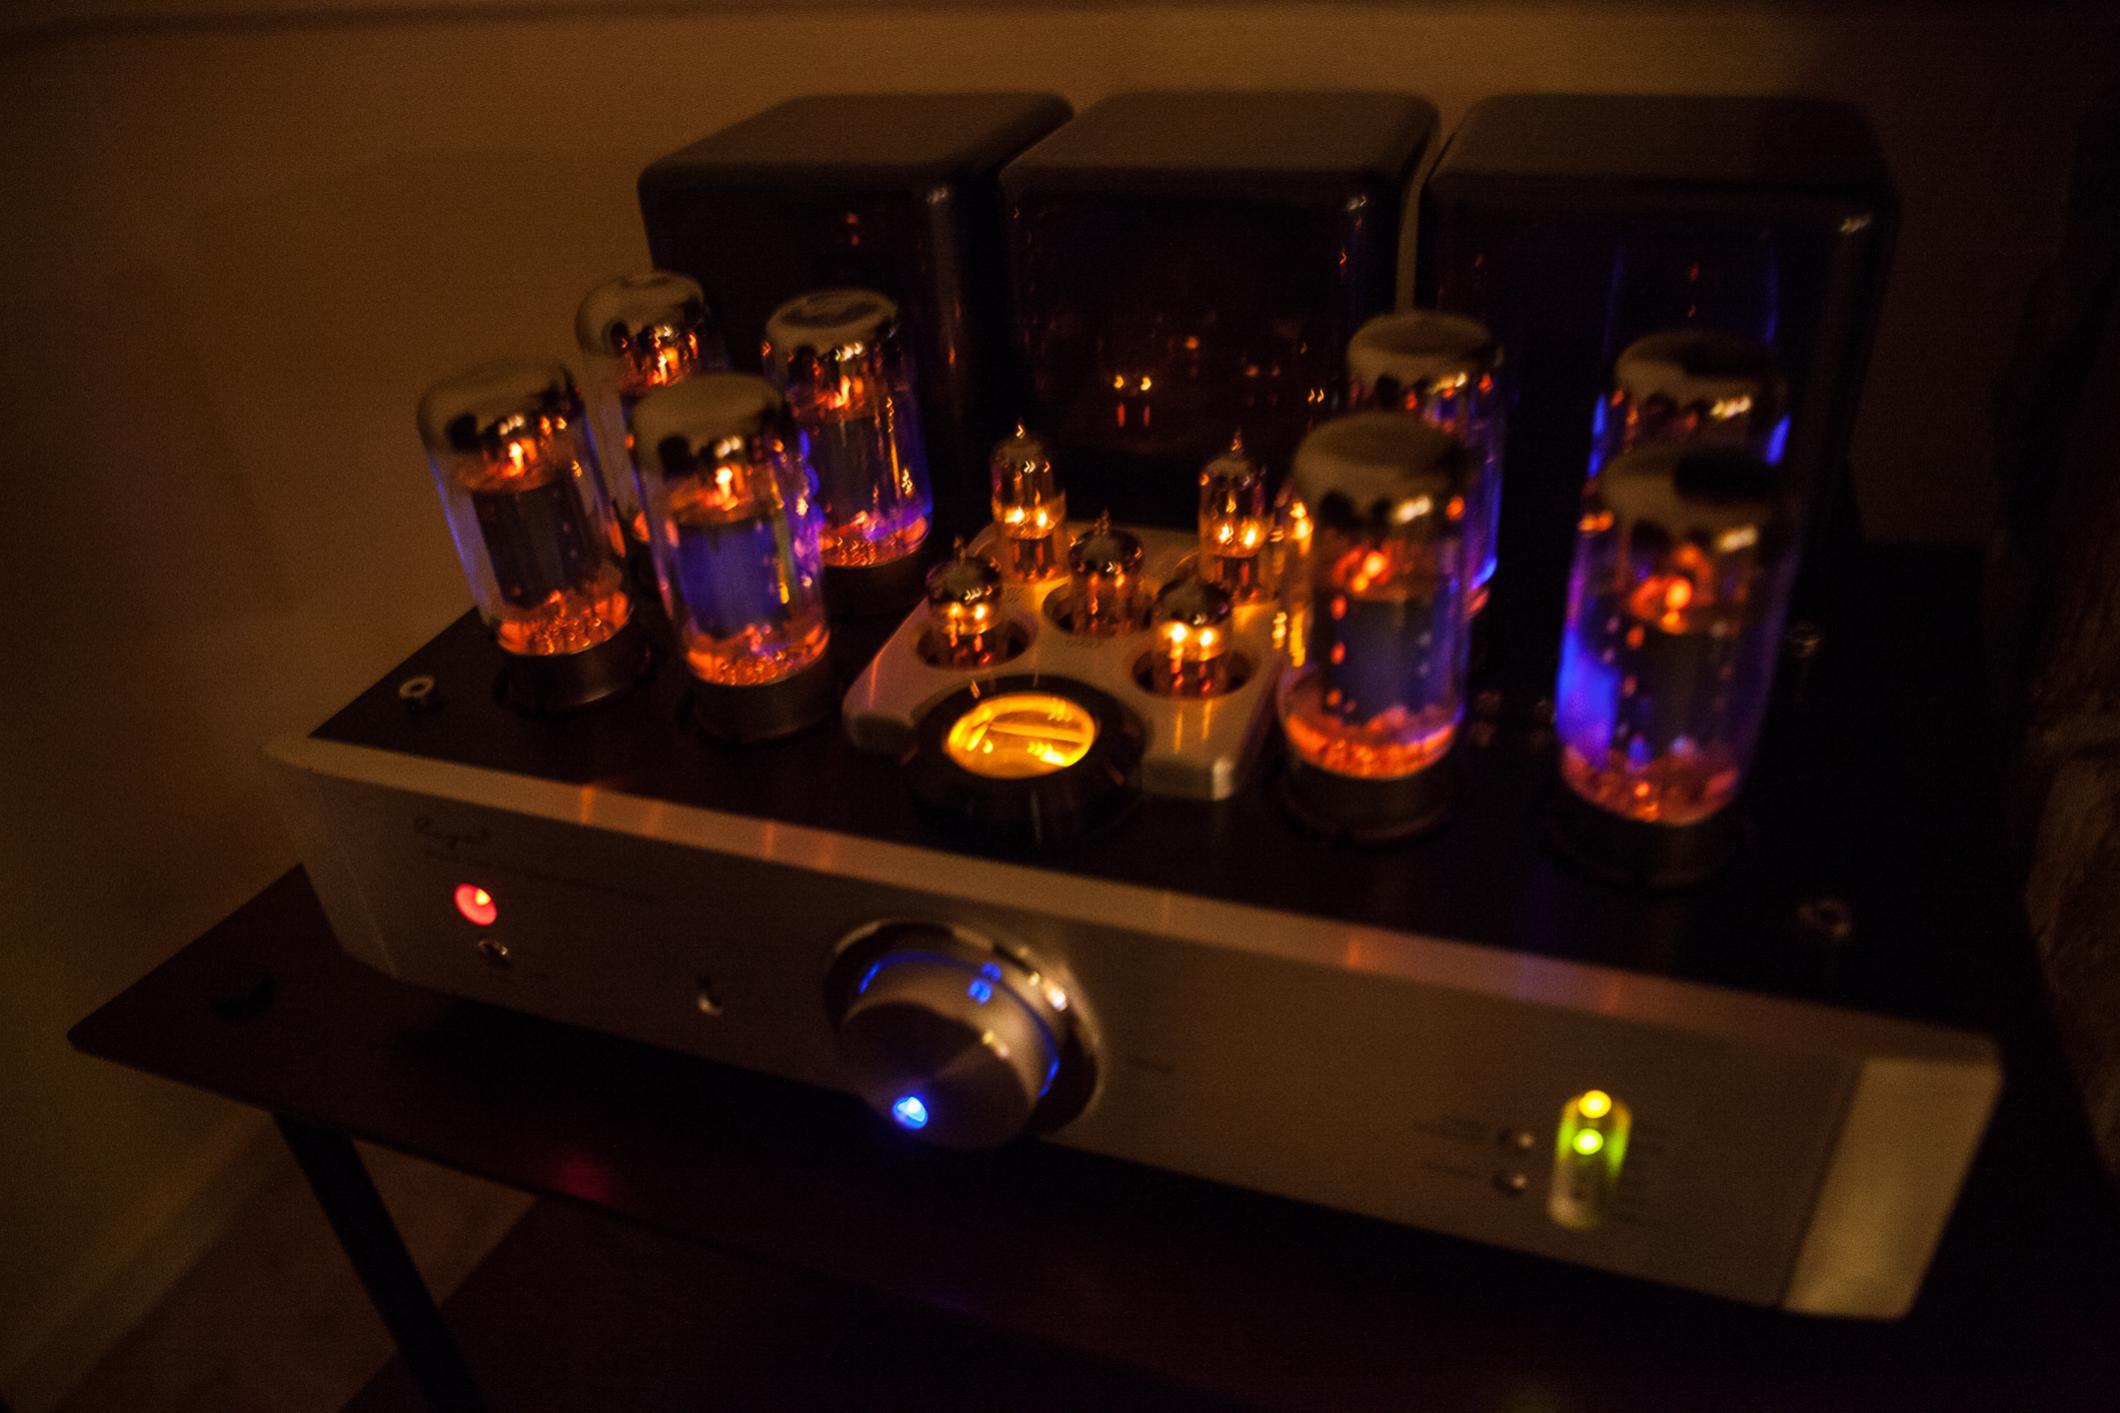 My 1st tube horror — Polk Audio